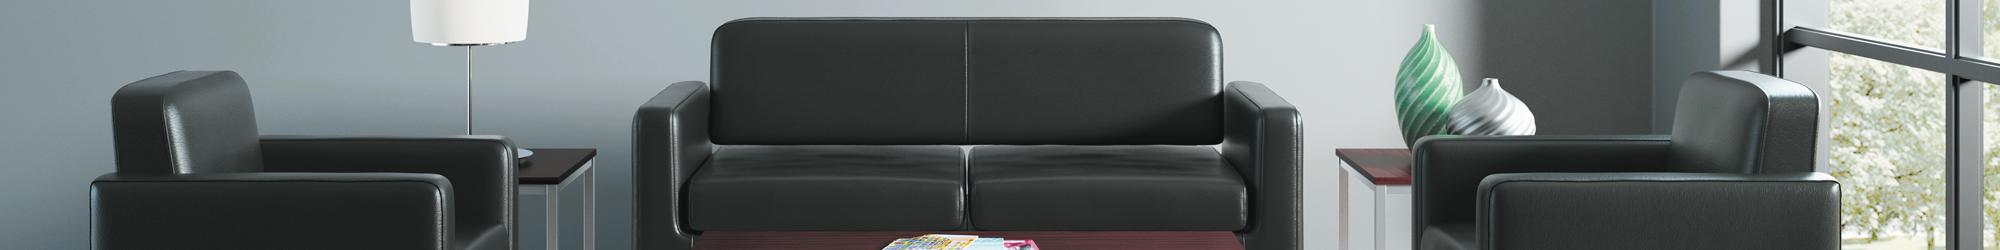 rental furniture office lobby